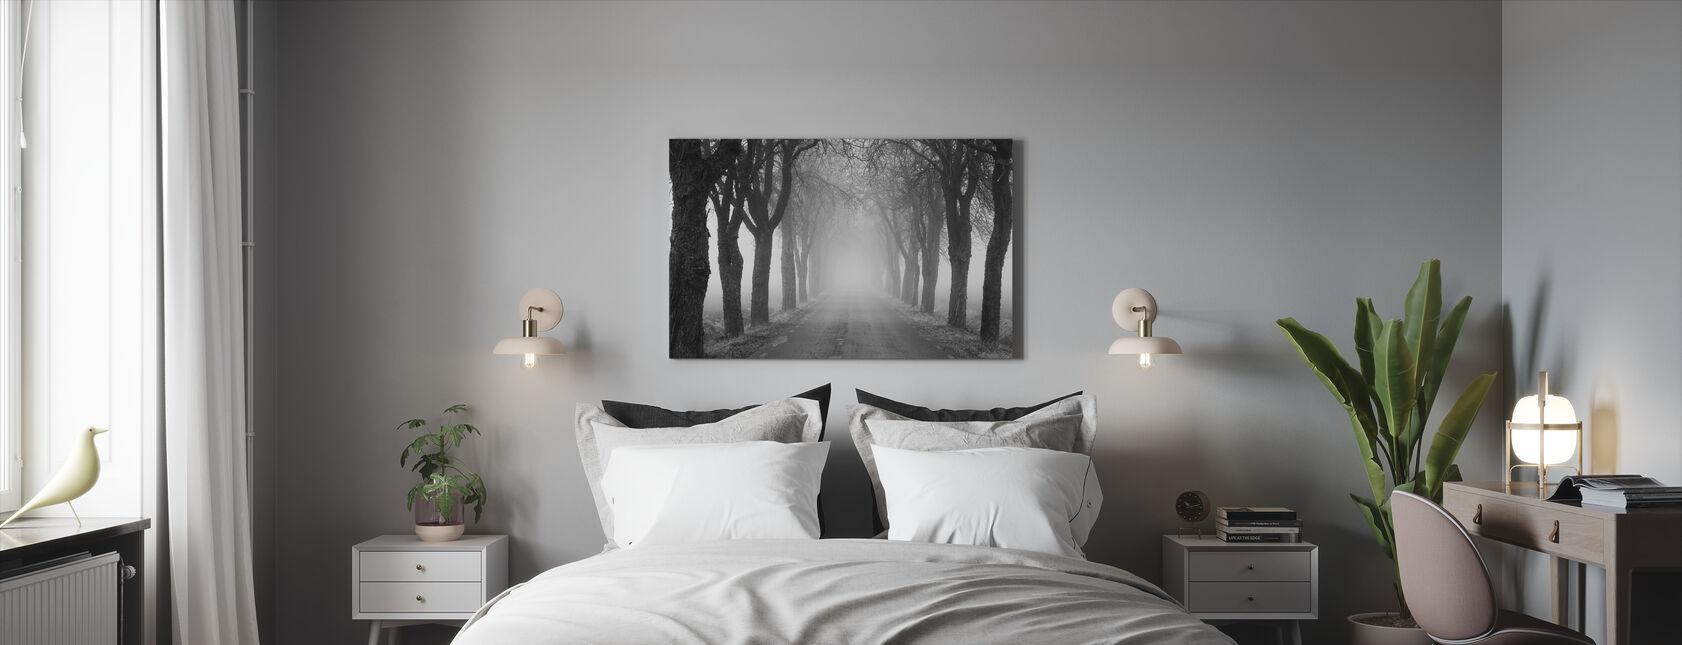 Avenue - Canvastaulu - Makuuhuone